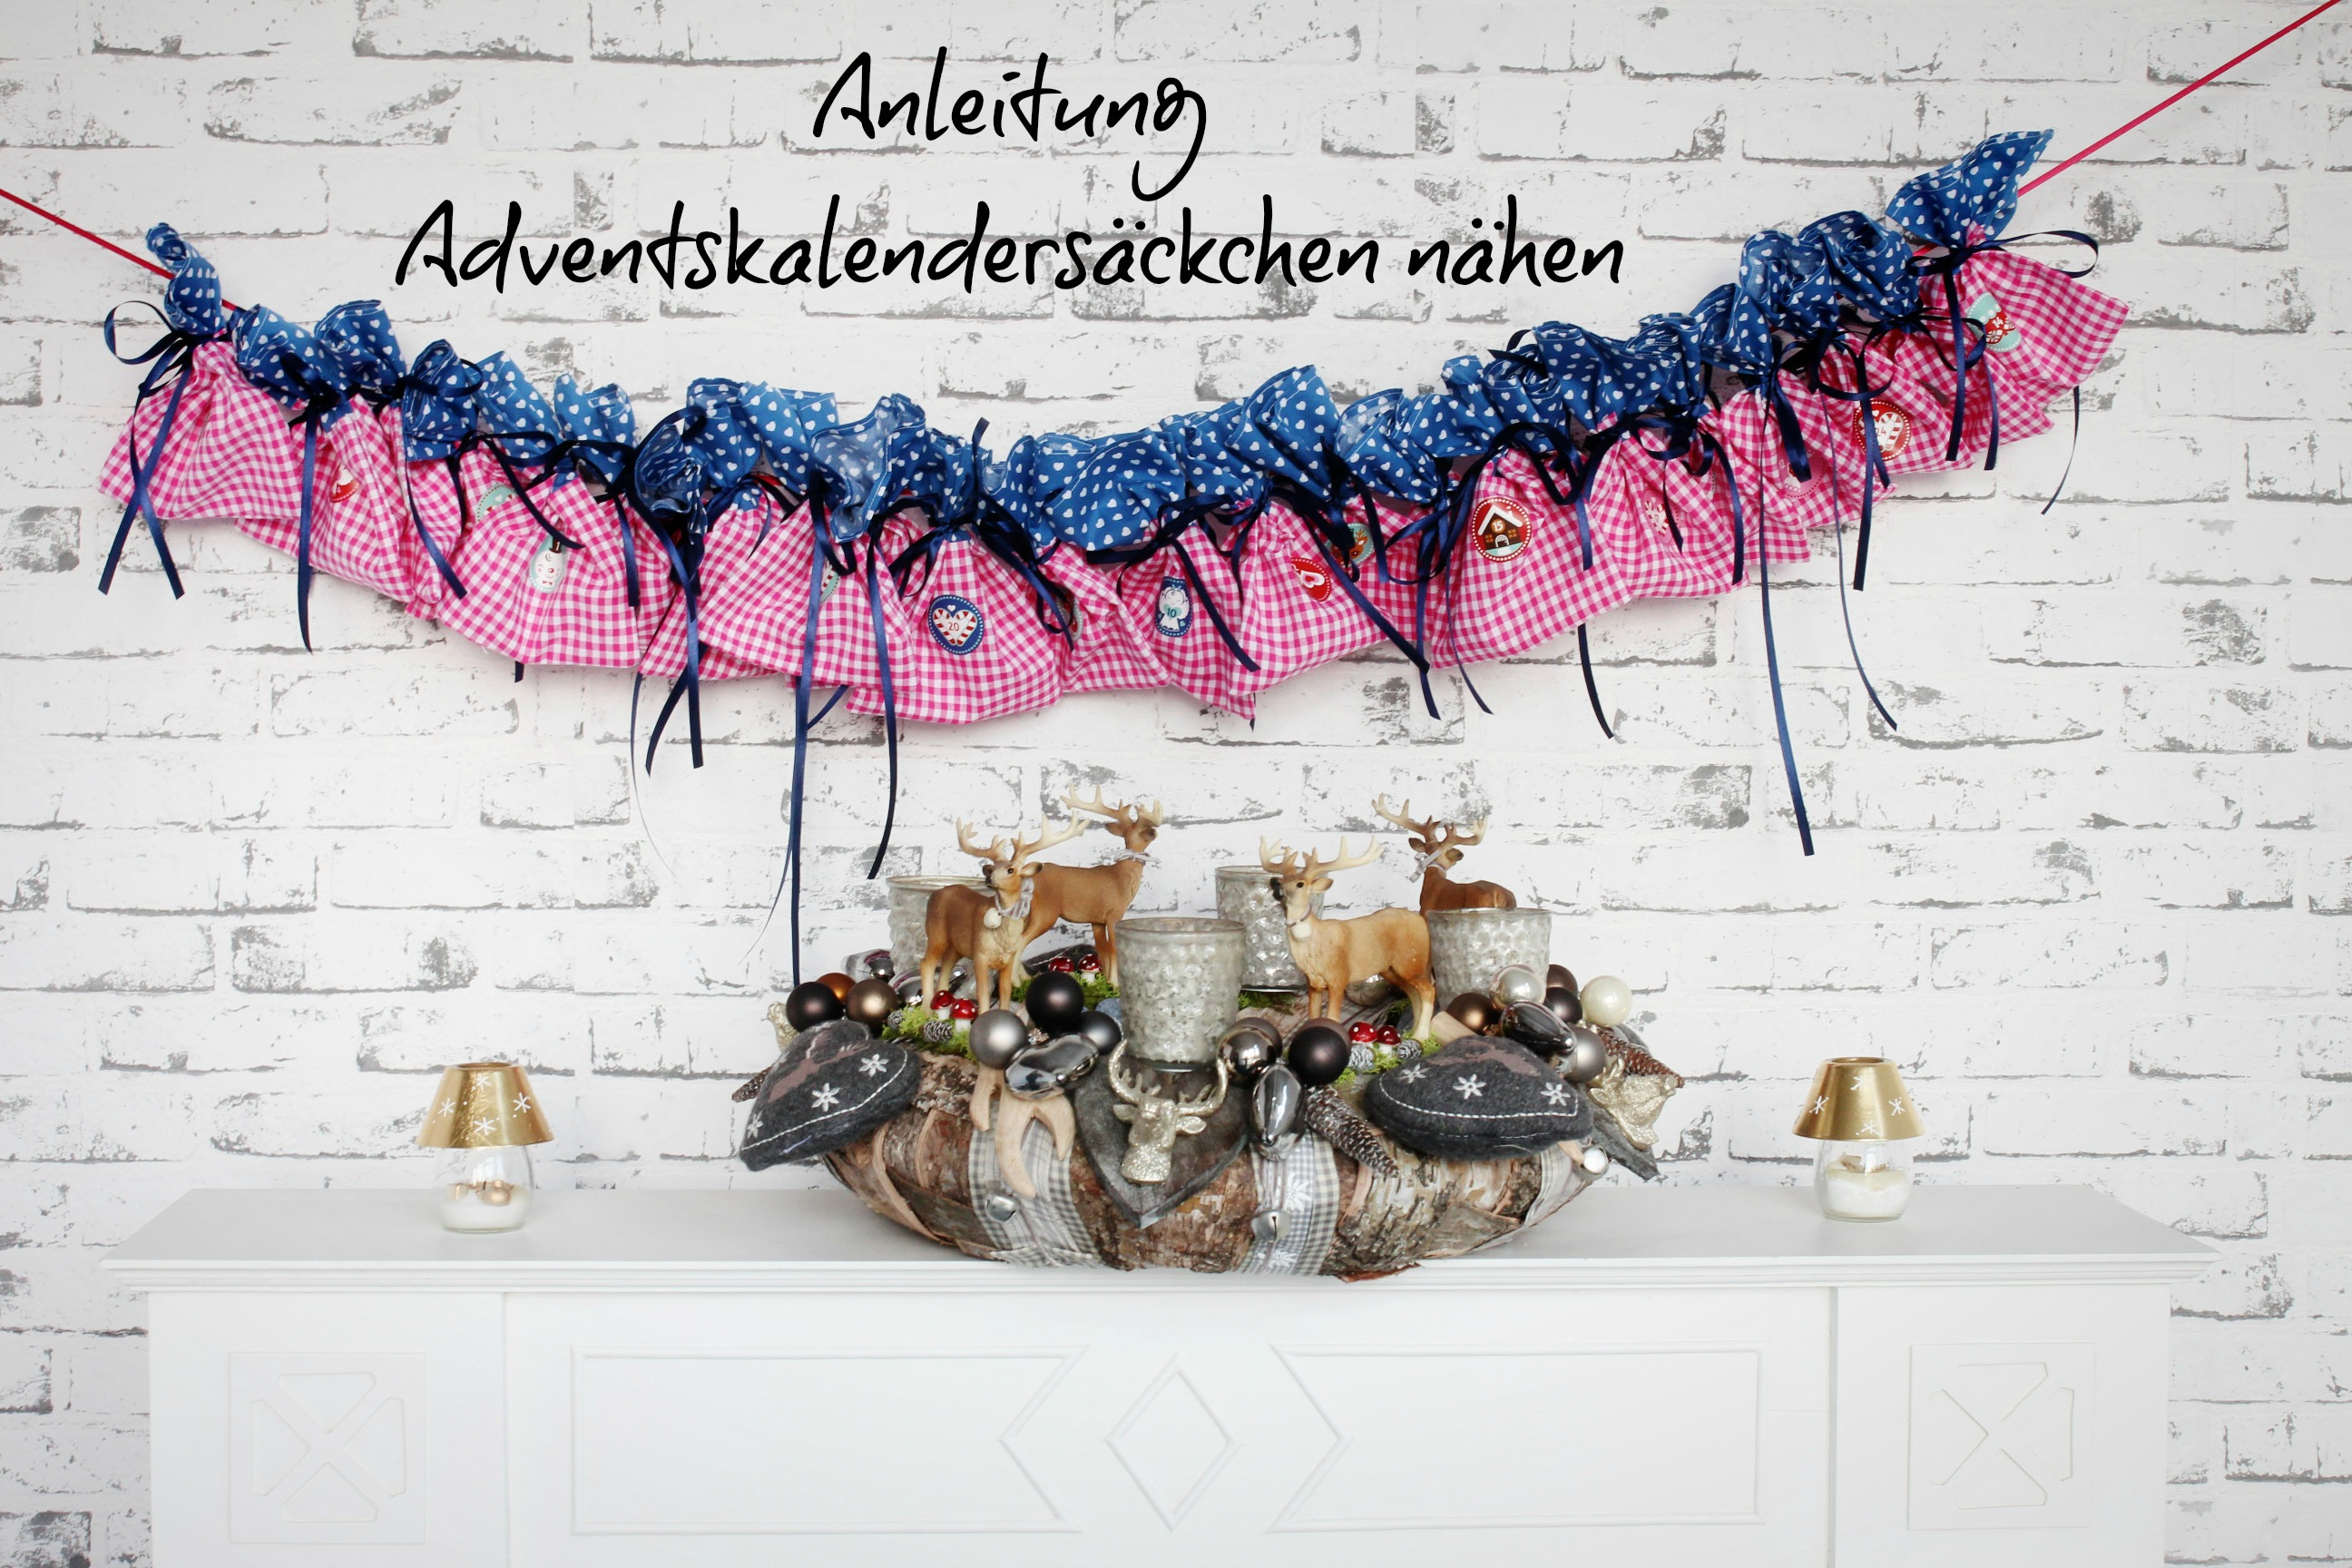 Anleitung Adventskalender nähen - Pech & Schwefel